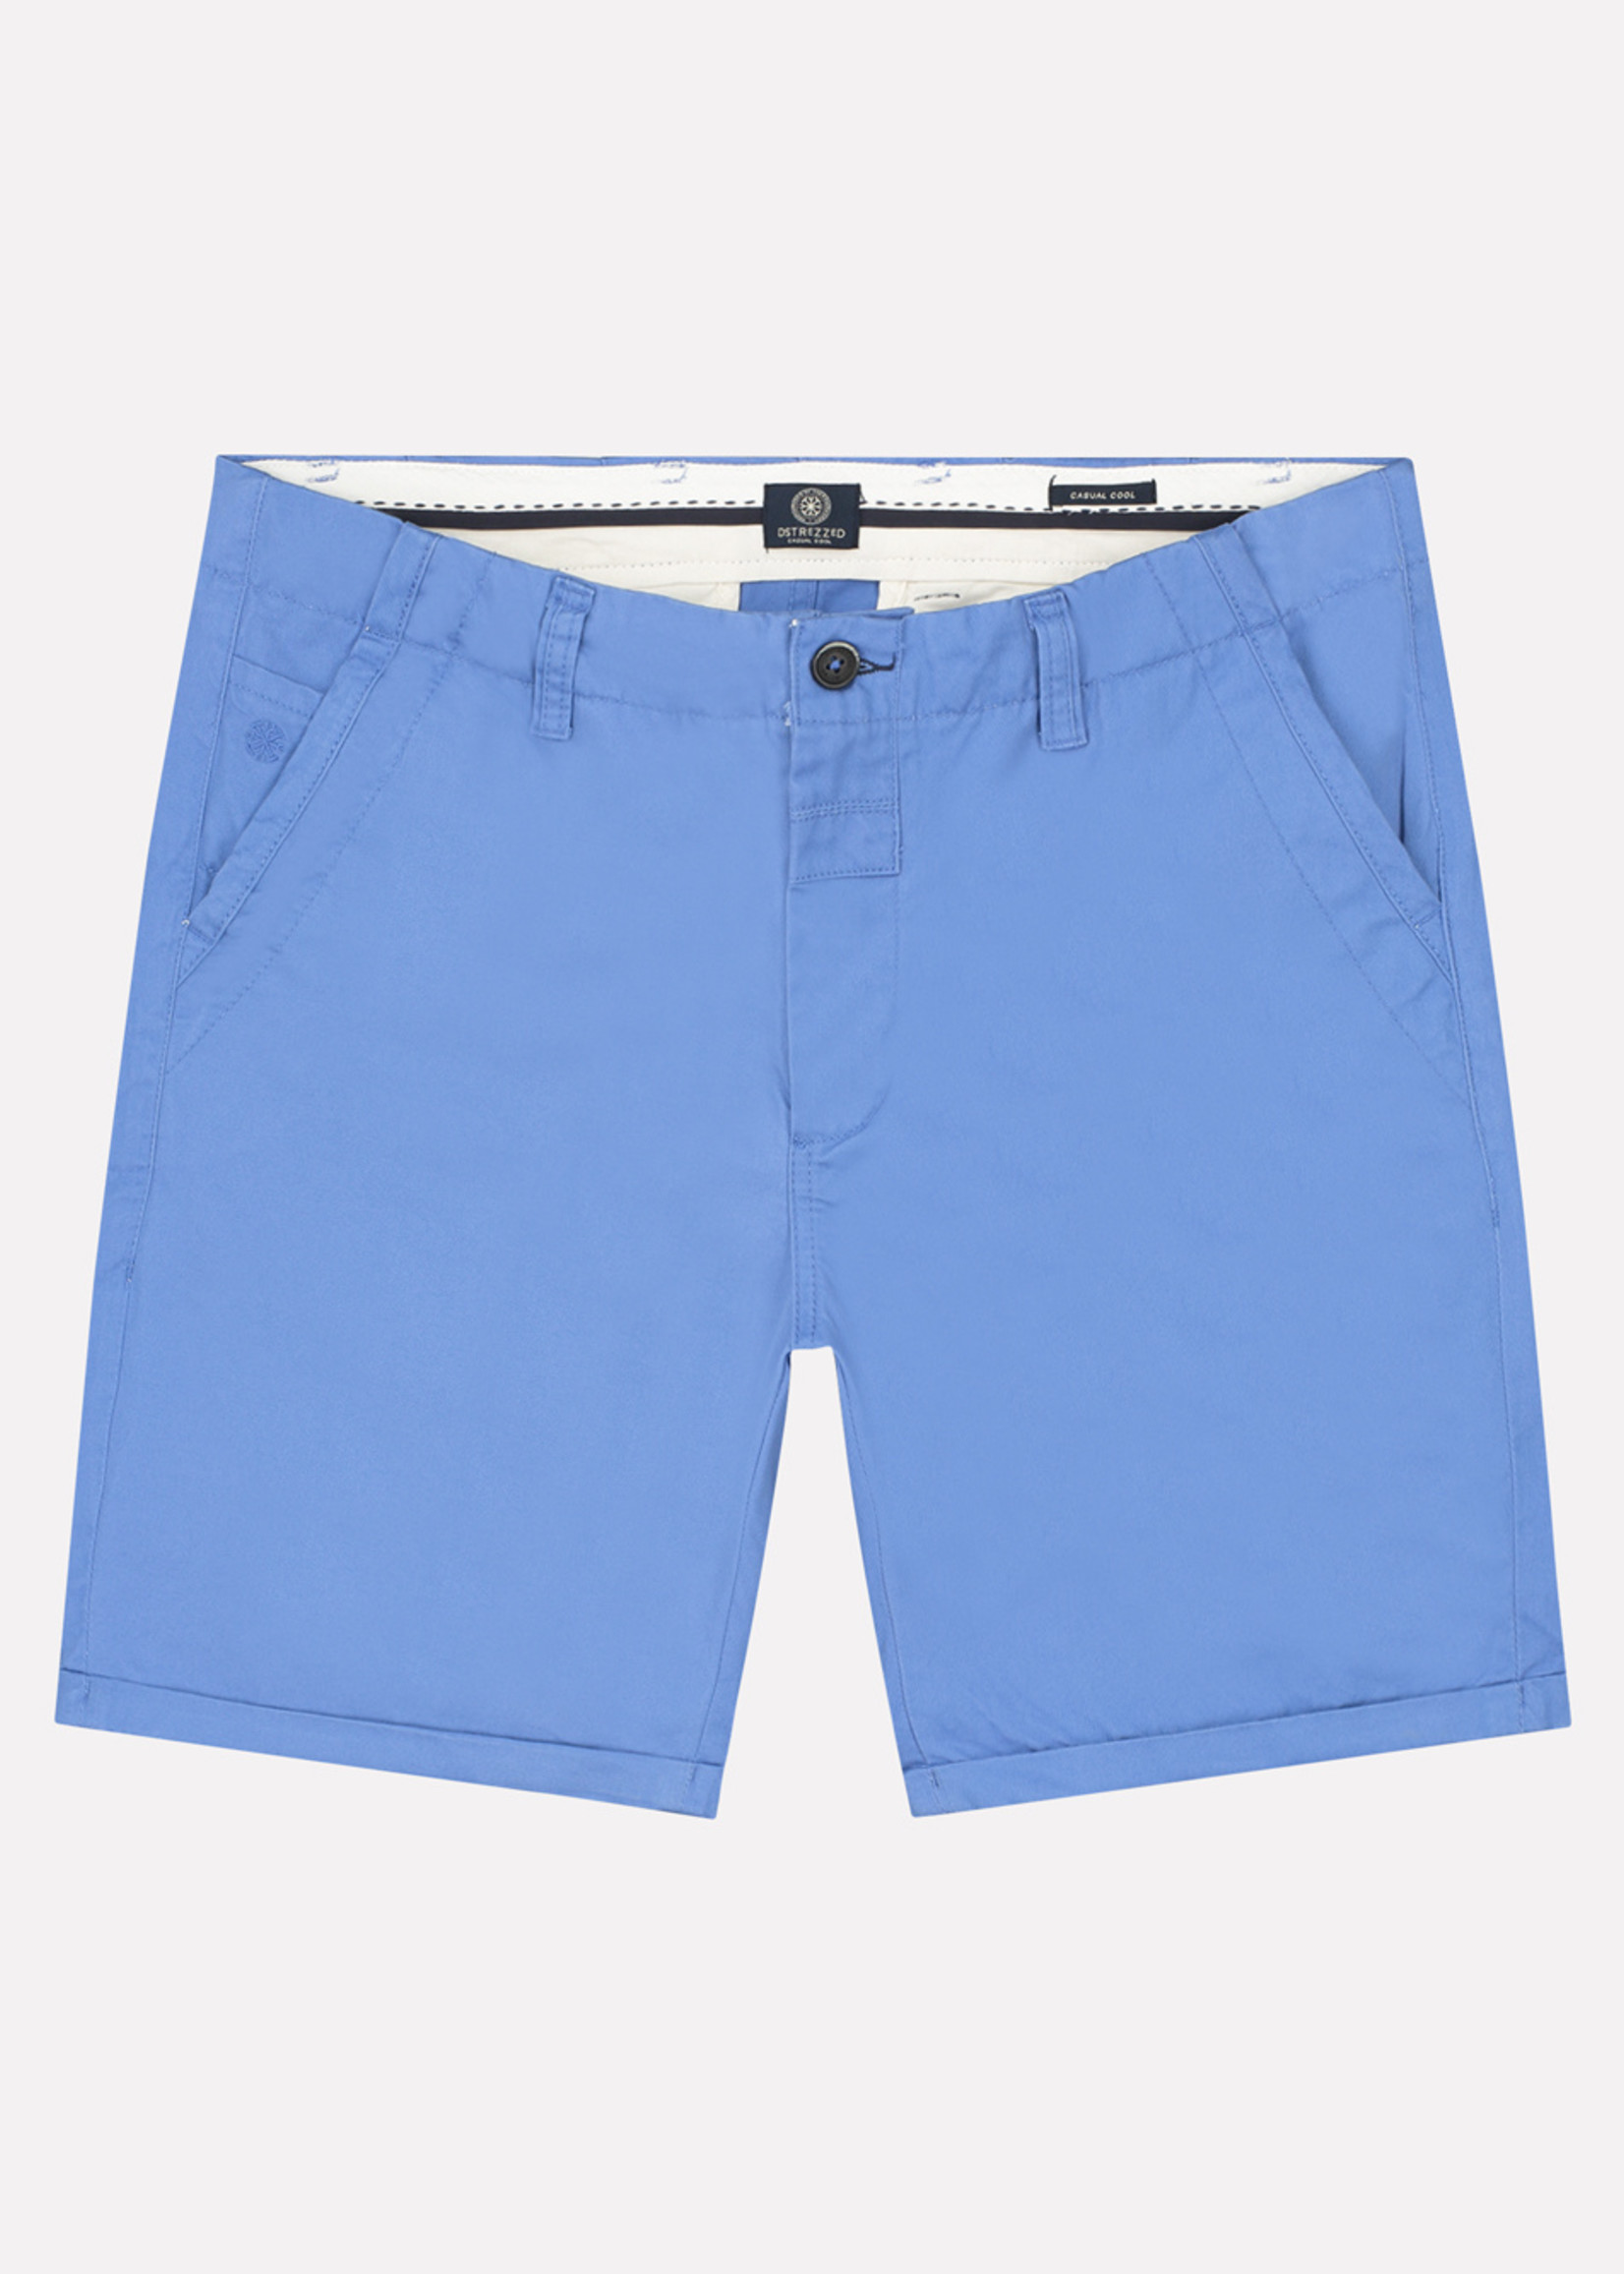 Dstrezzed Le Presley Chino short | Bleu clair | Dstrezzed